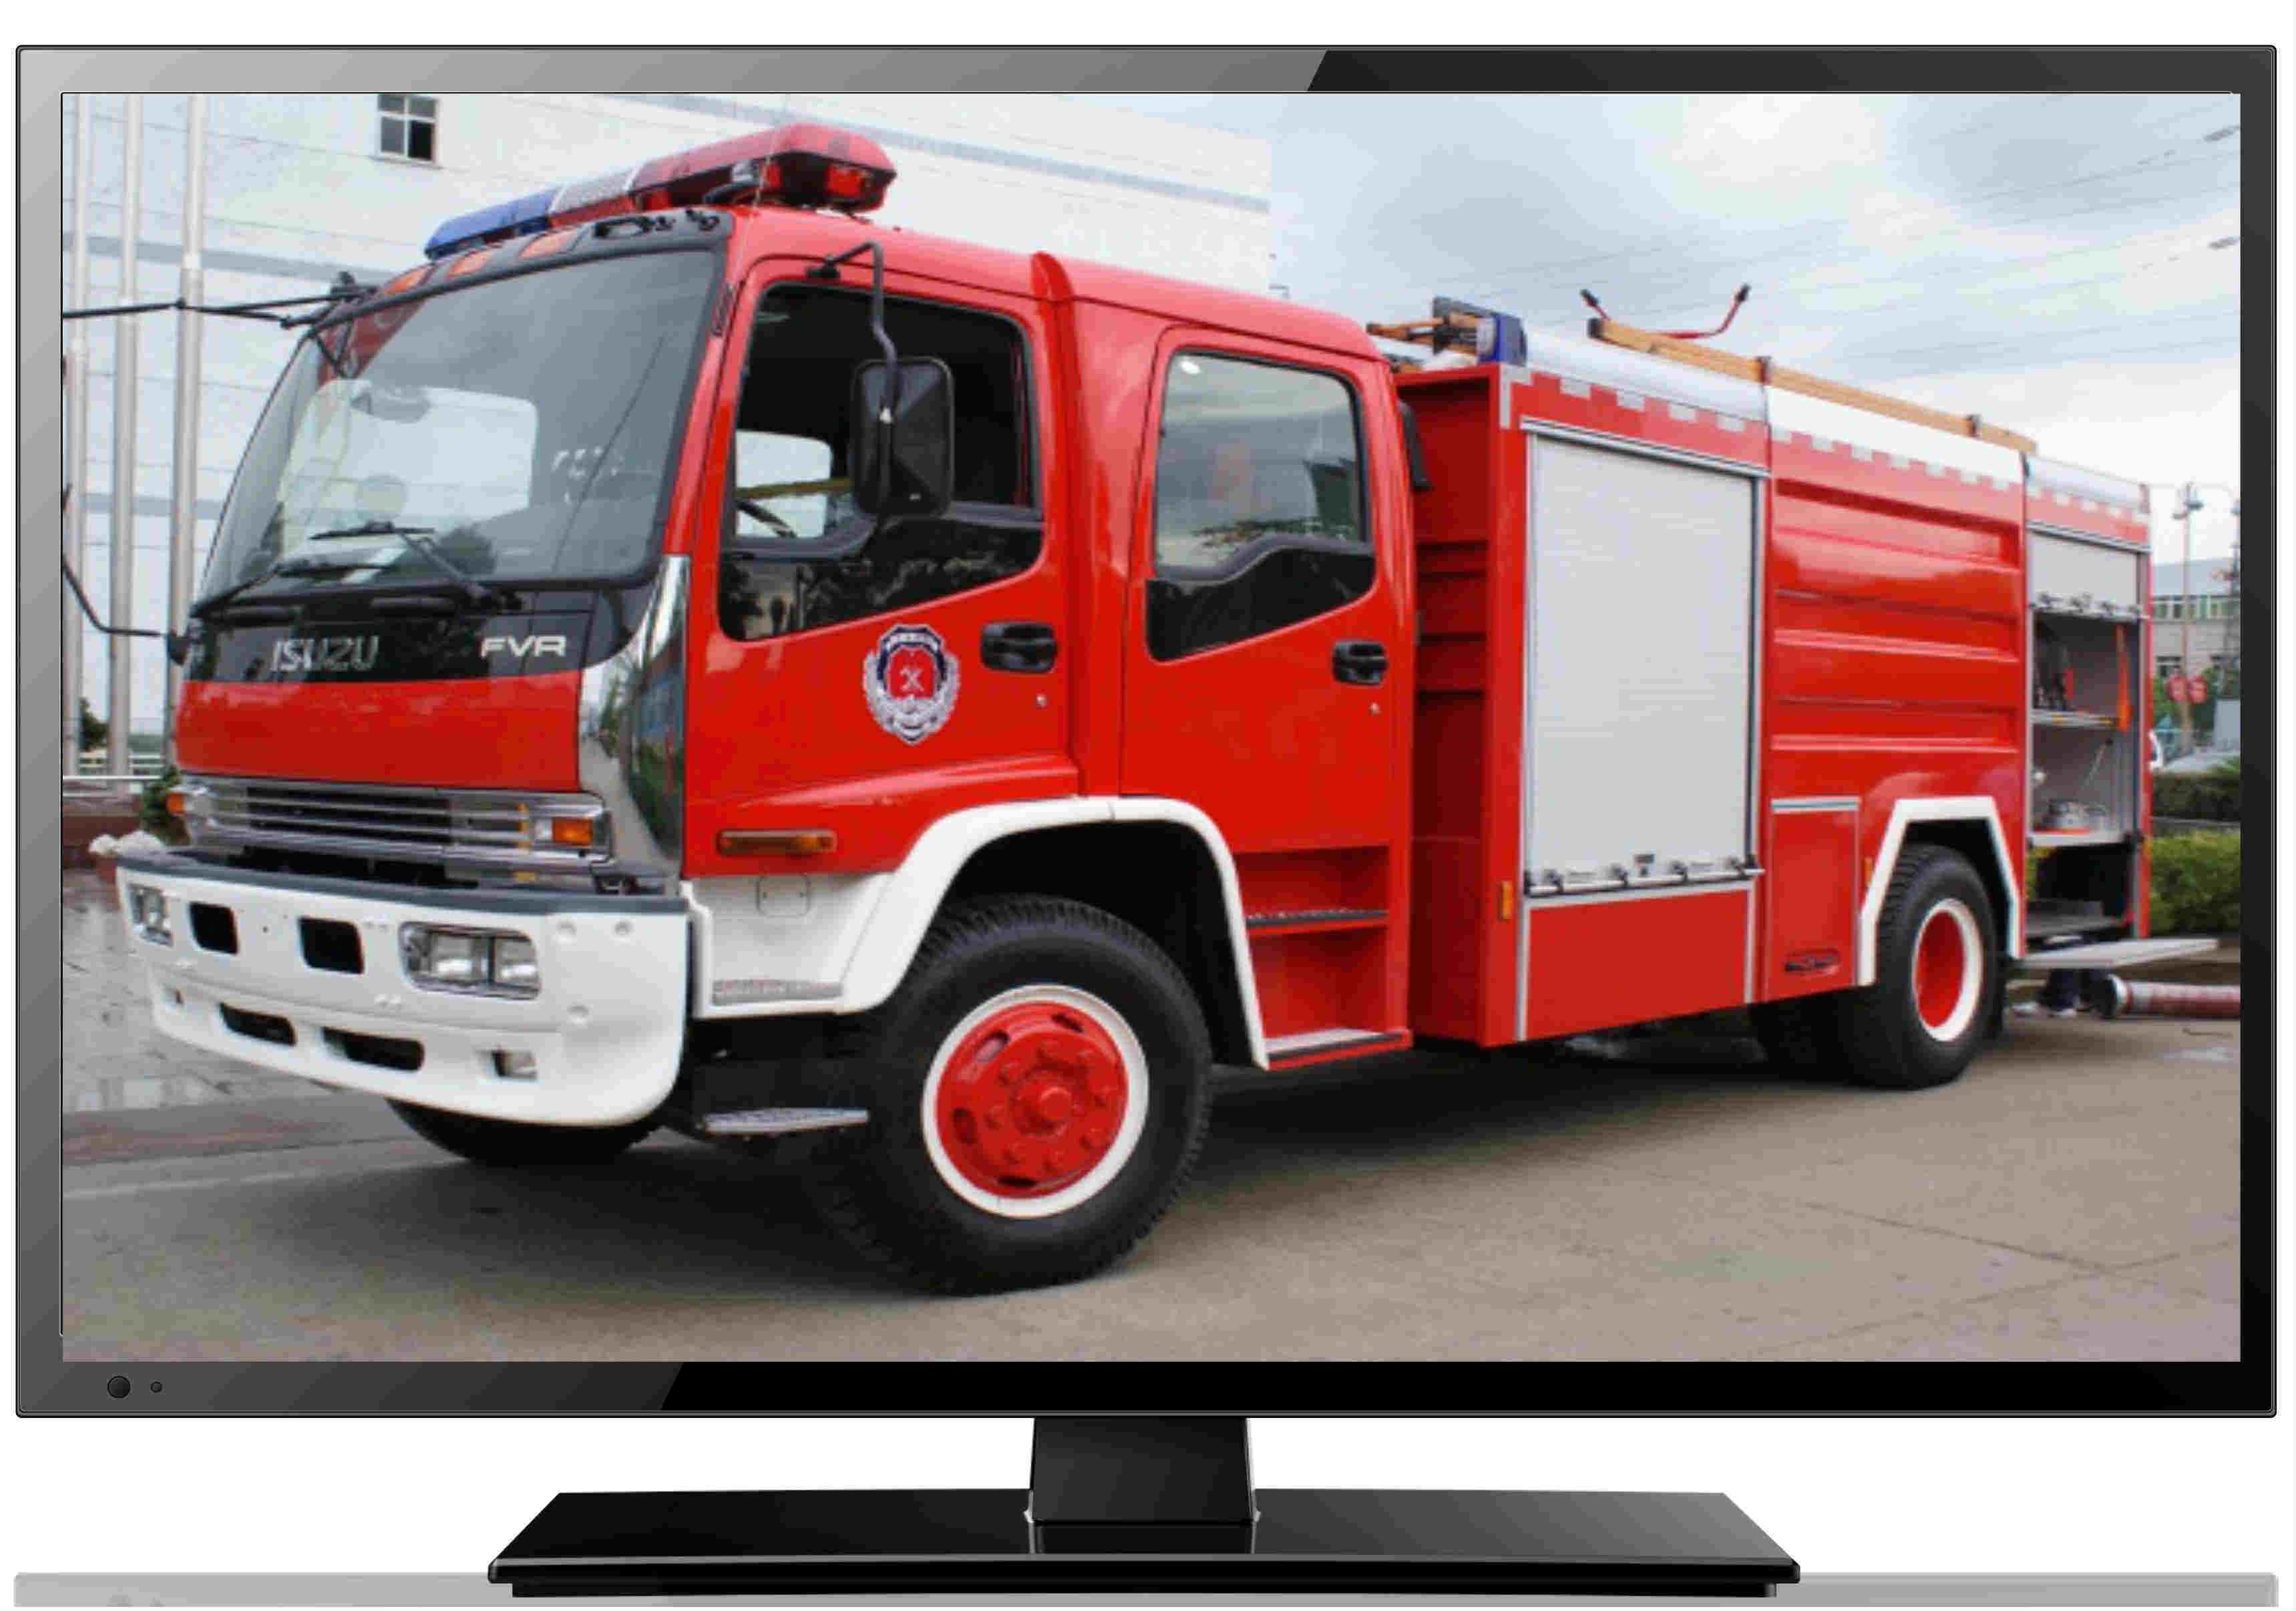 12 Volts Car TFT LED TV Built in DVB-T Tuner